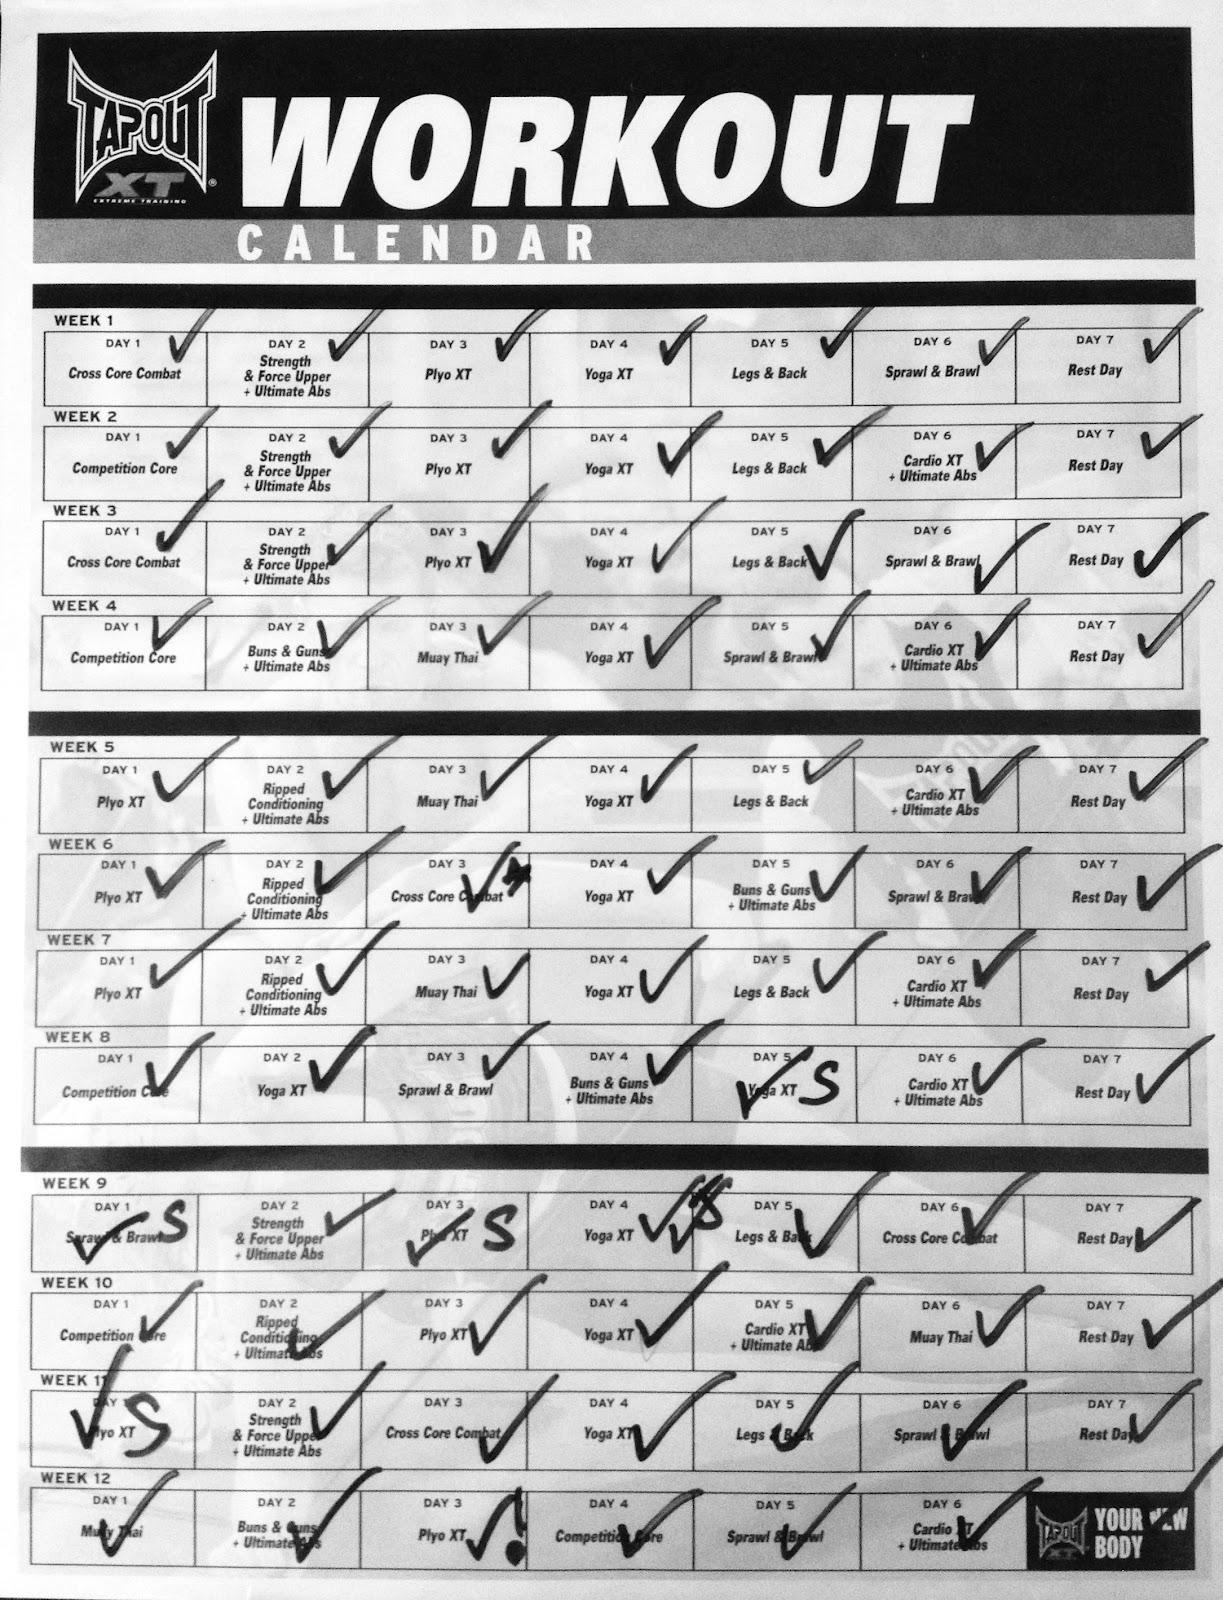 tapout xt calendar insanity workout calendar pdf tapout xt workout ...